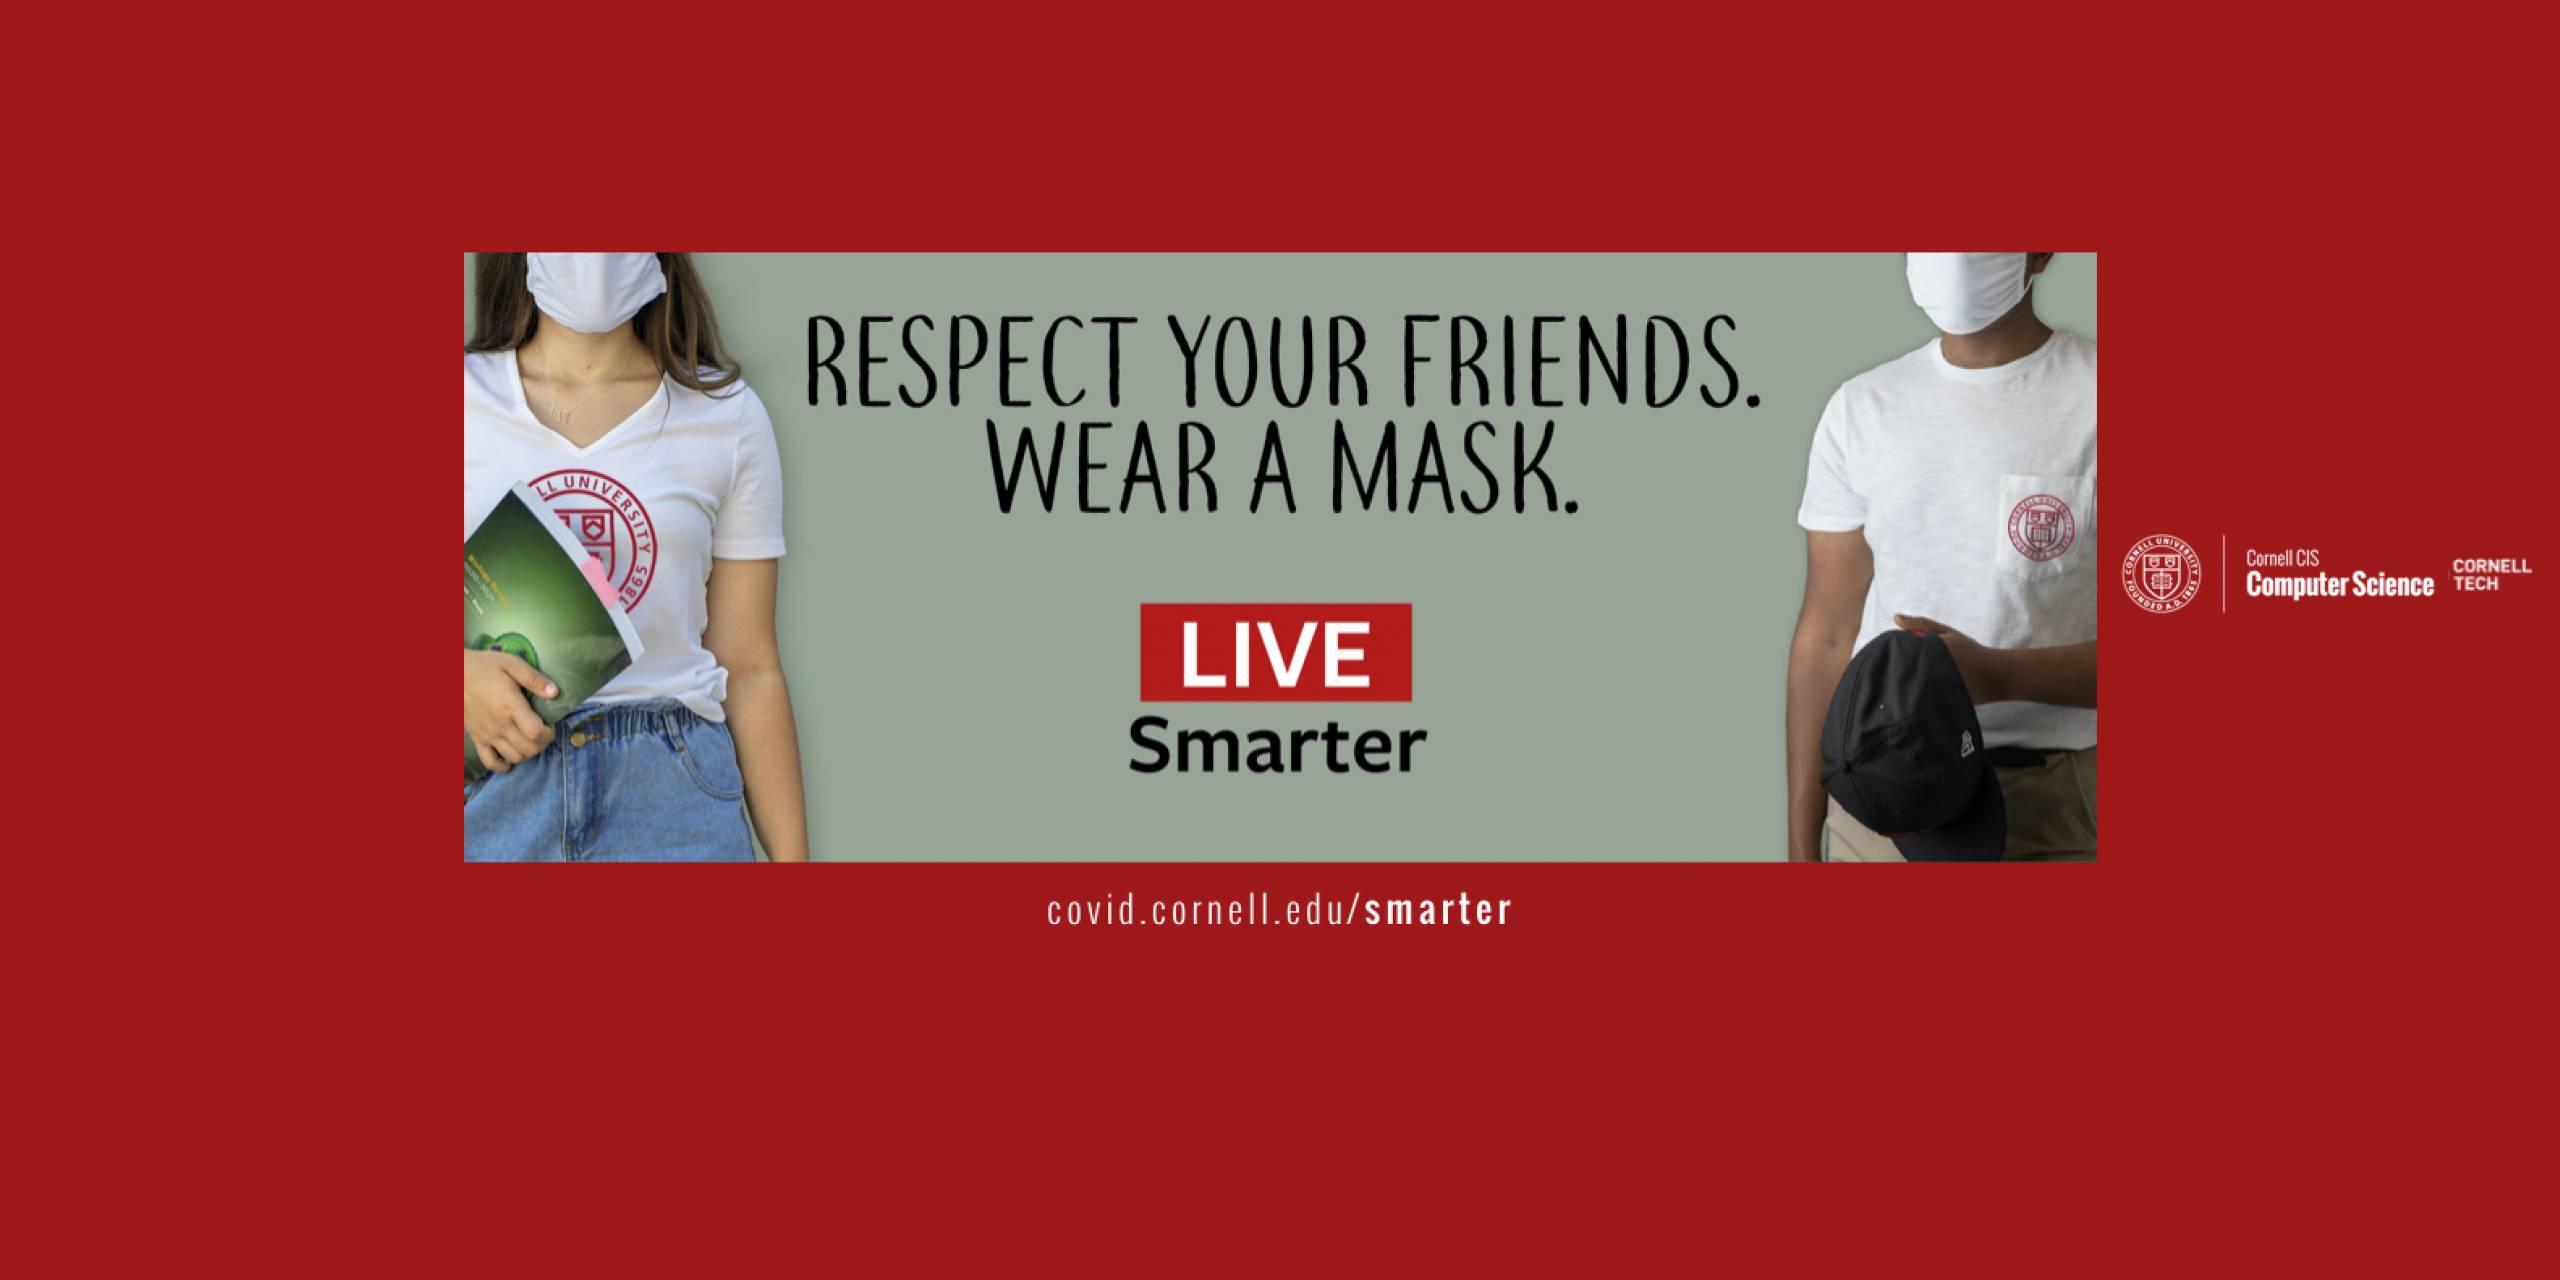 Live Smarter, Wear a Mask